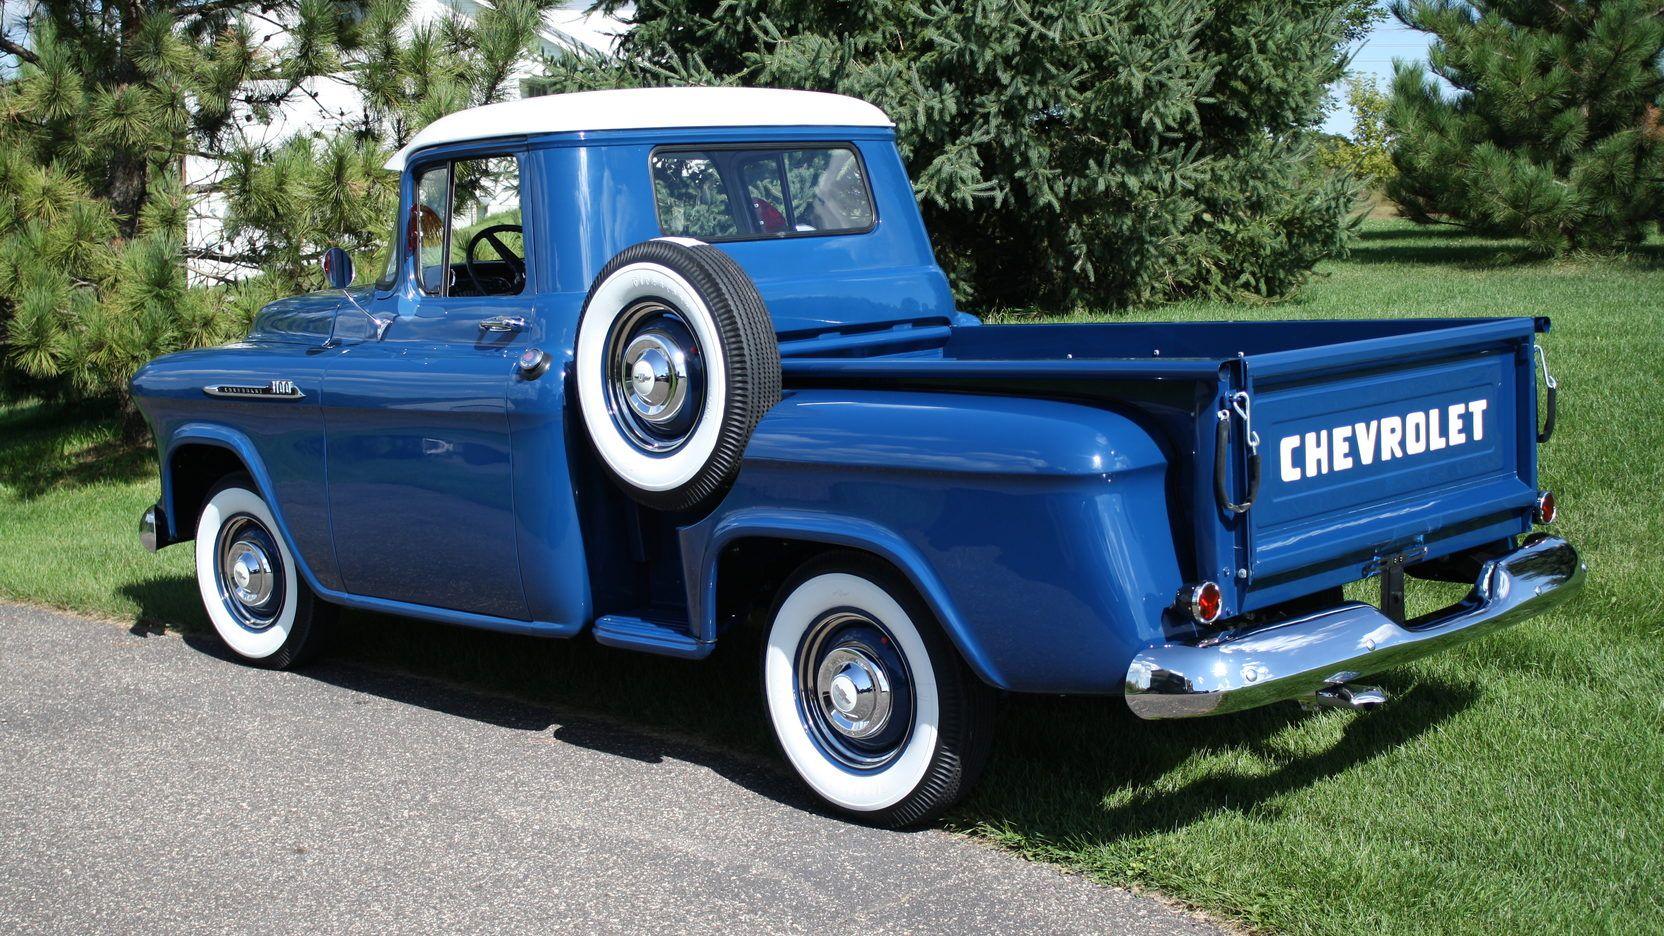 1956 chevrolet 3100 pickup chevrolet task force wikipedia classic trucks pinterest chevrolet classic trucks and chevy